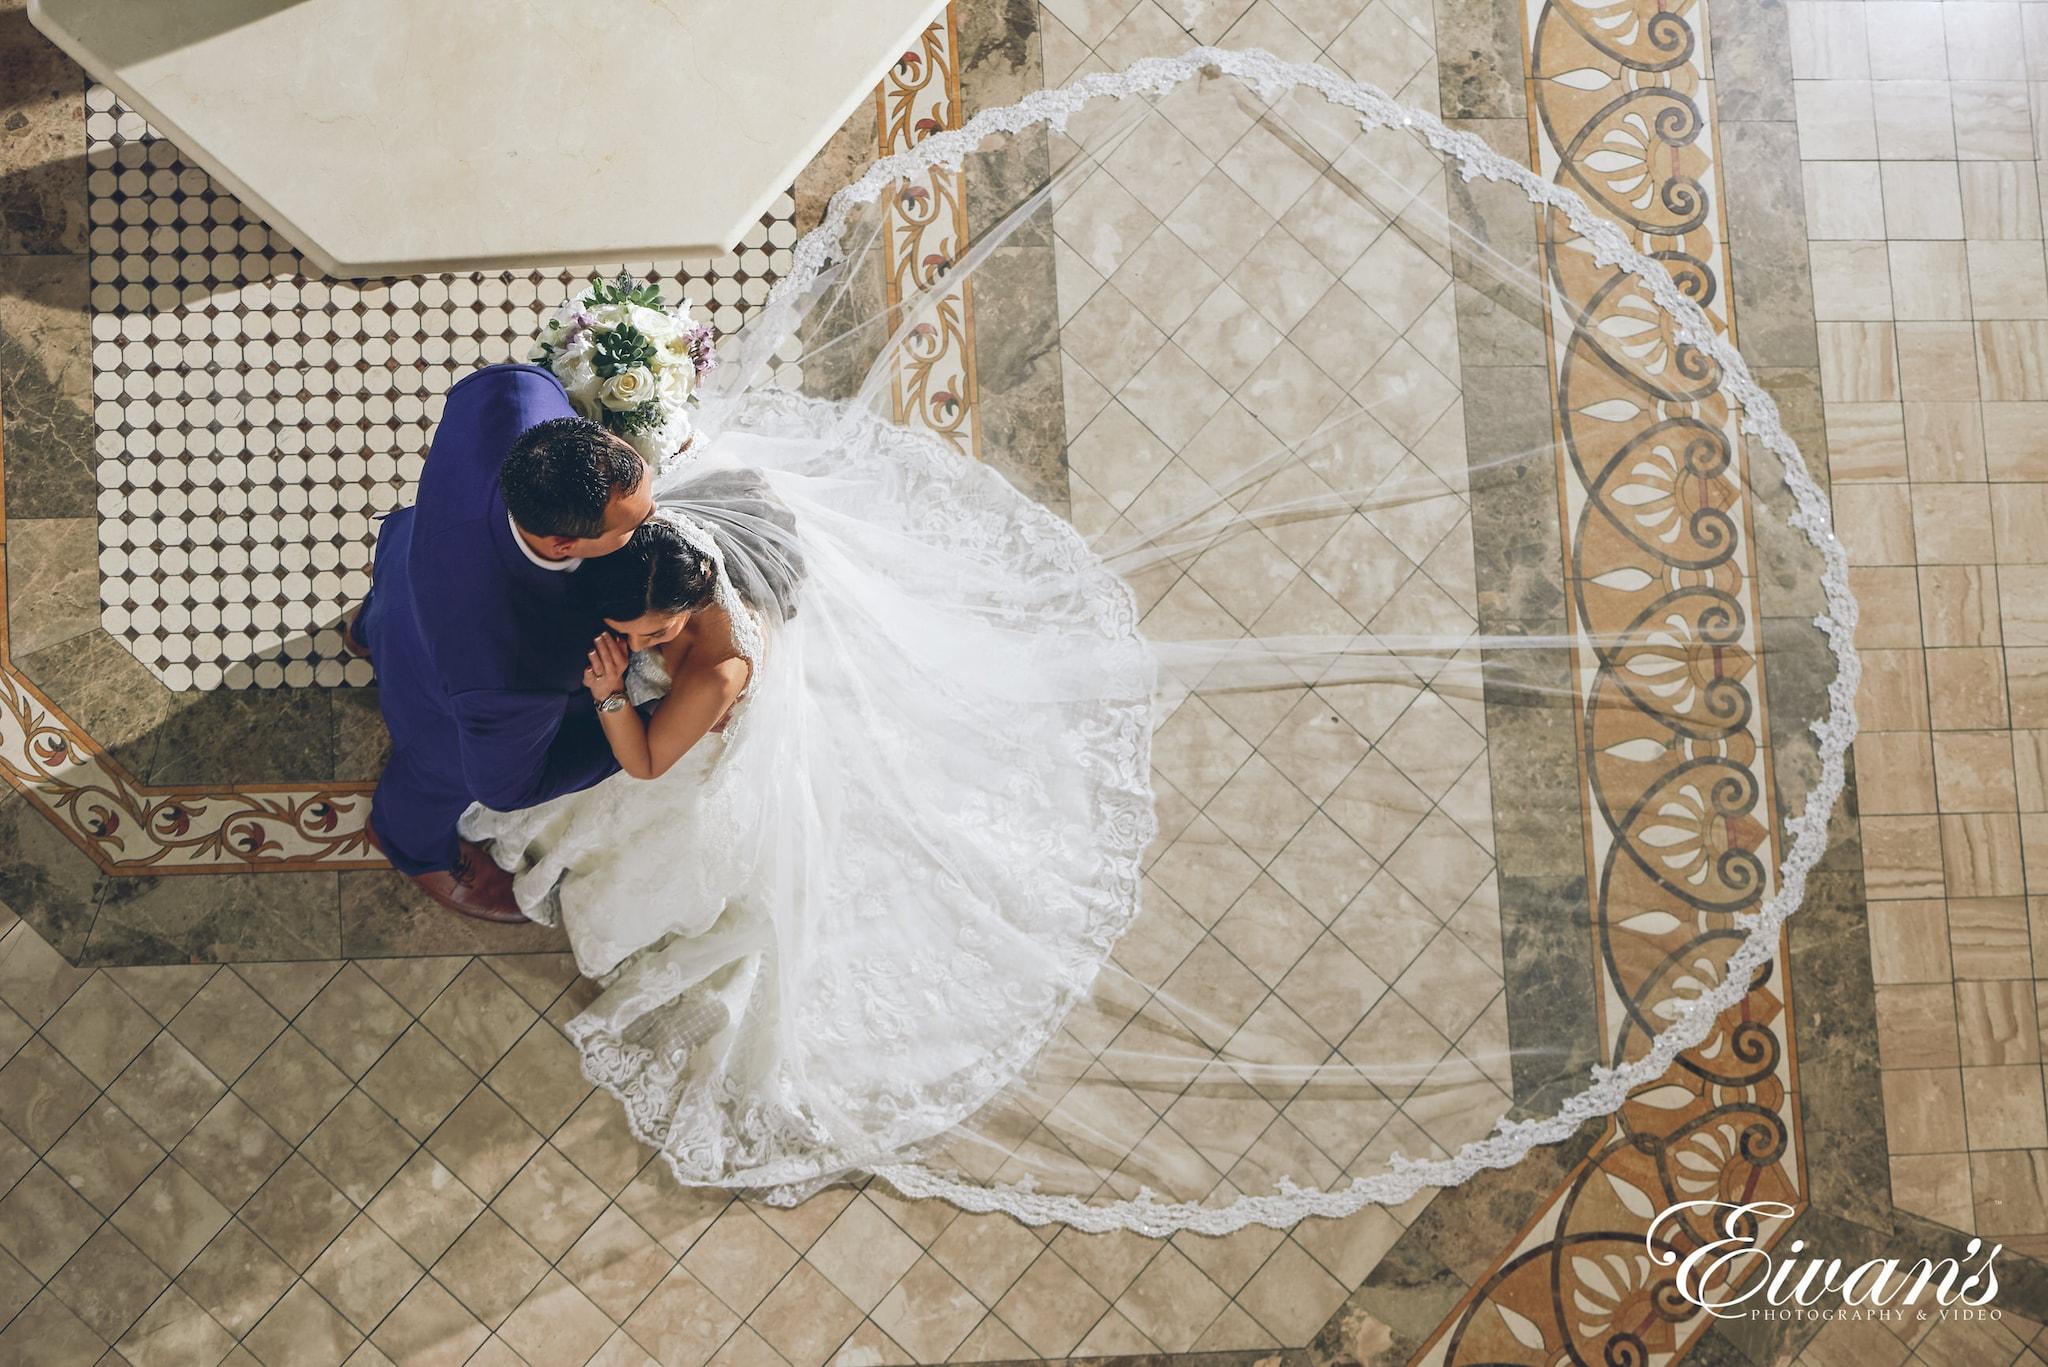 birdseye shot of bride and groom